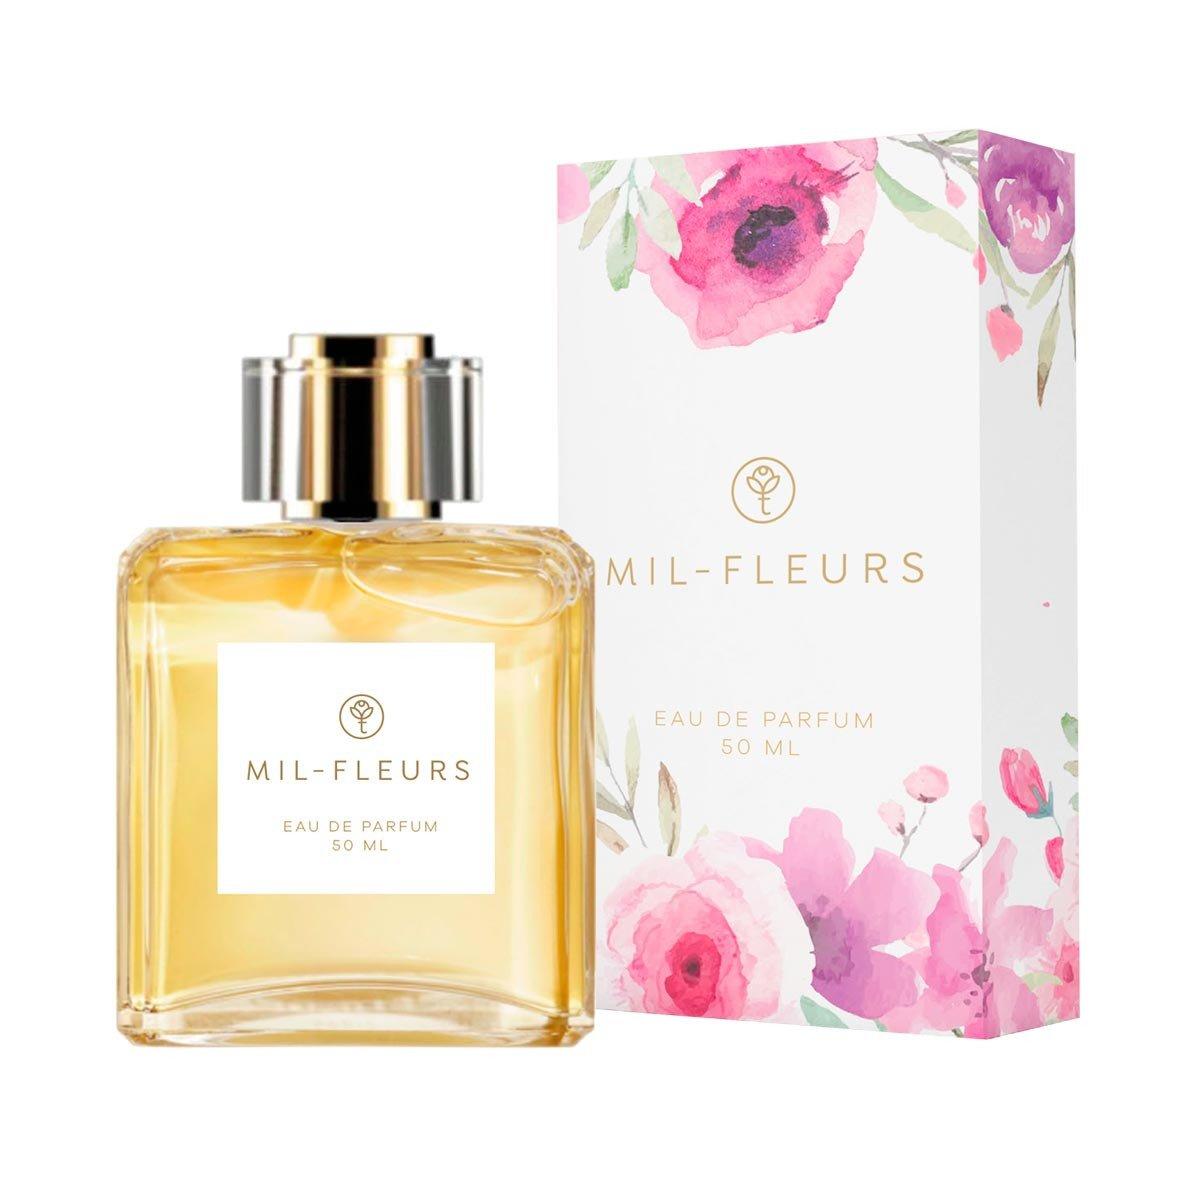 Perfume Mil Fleurs Edp 50 ml Rosatel